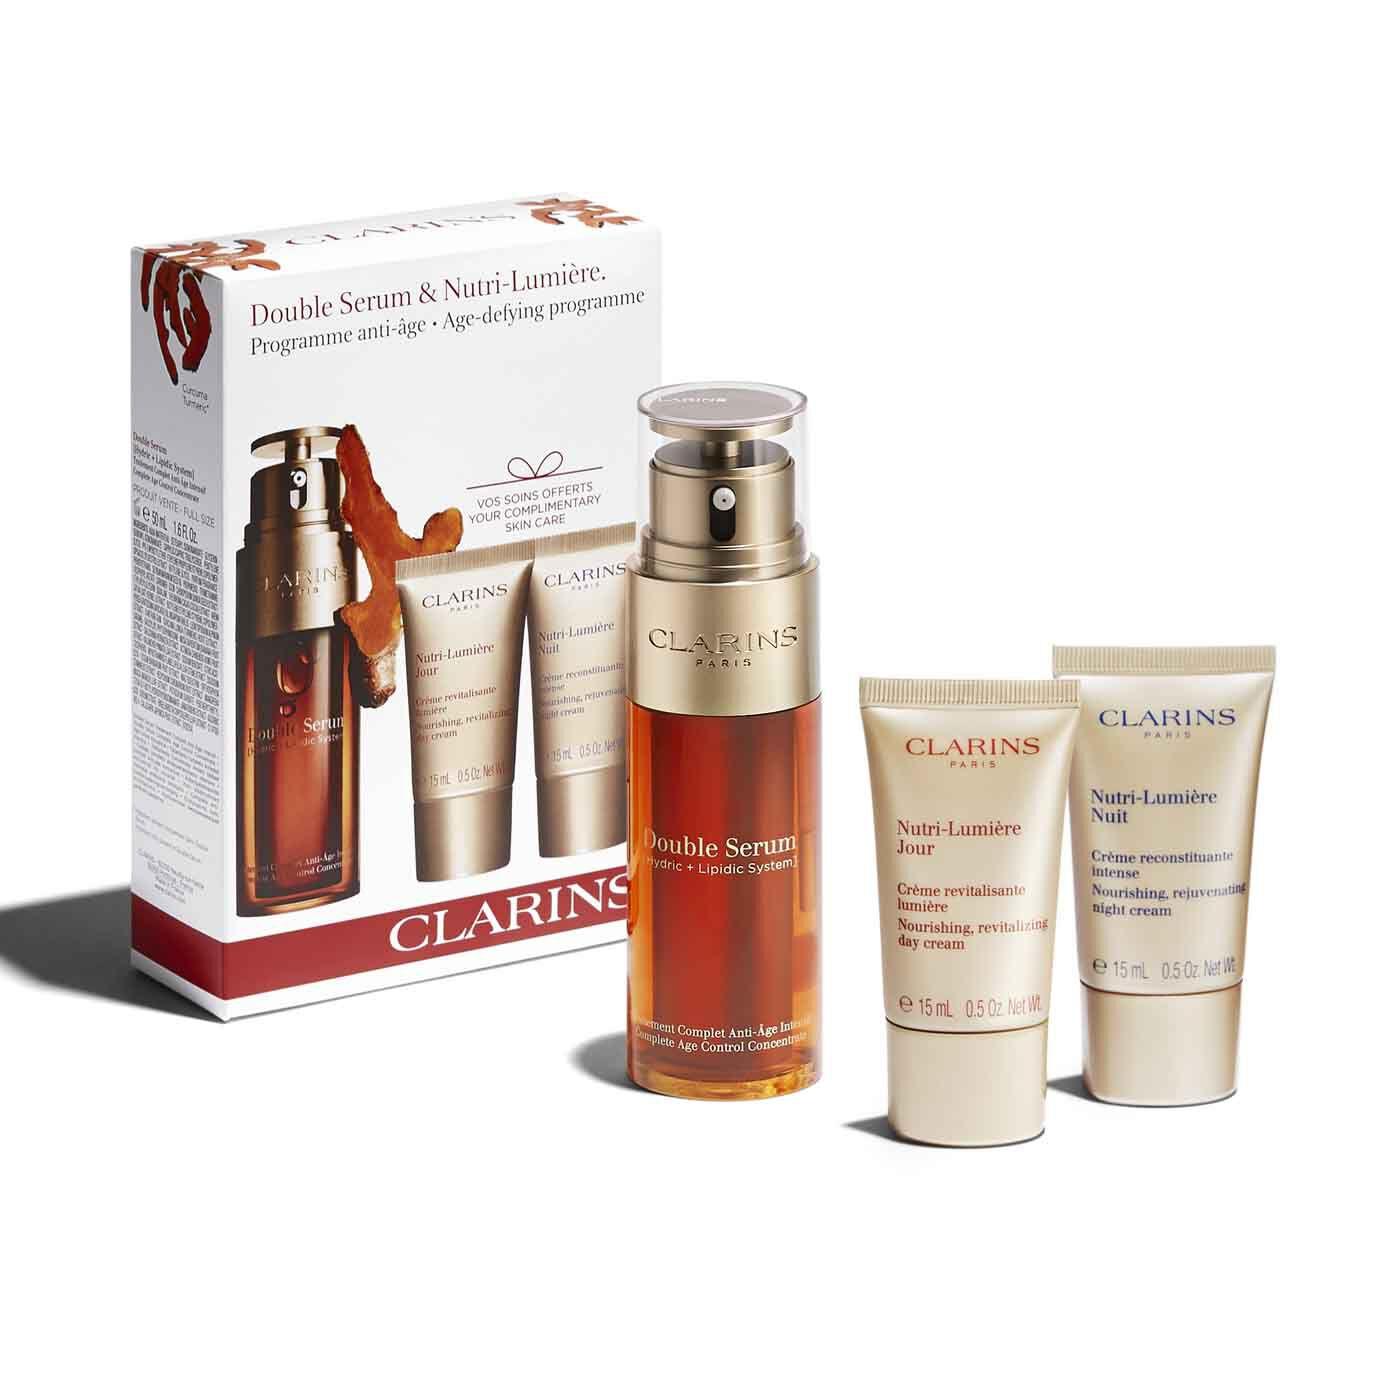 Gesichtspflege-Set Double Serum & Nutri-Lumière Anti-Age Pflege.